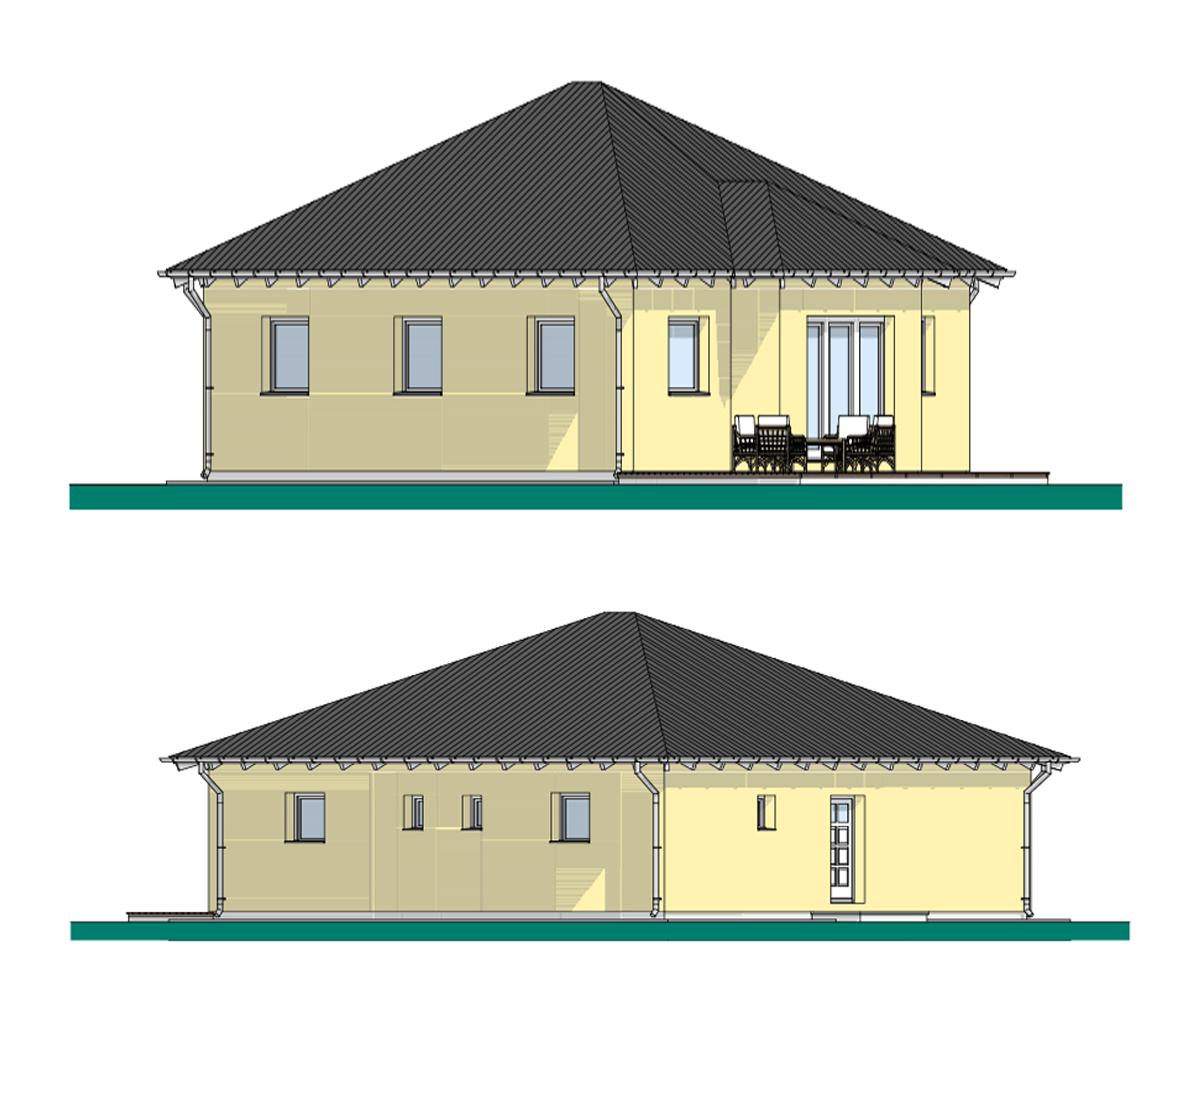 http://www.dasloewenhaus.at/wp-content/uploads/2017/06/110W_1.jpg